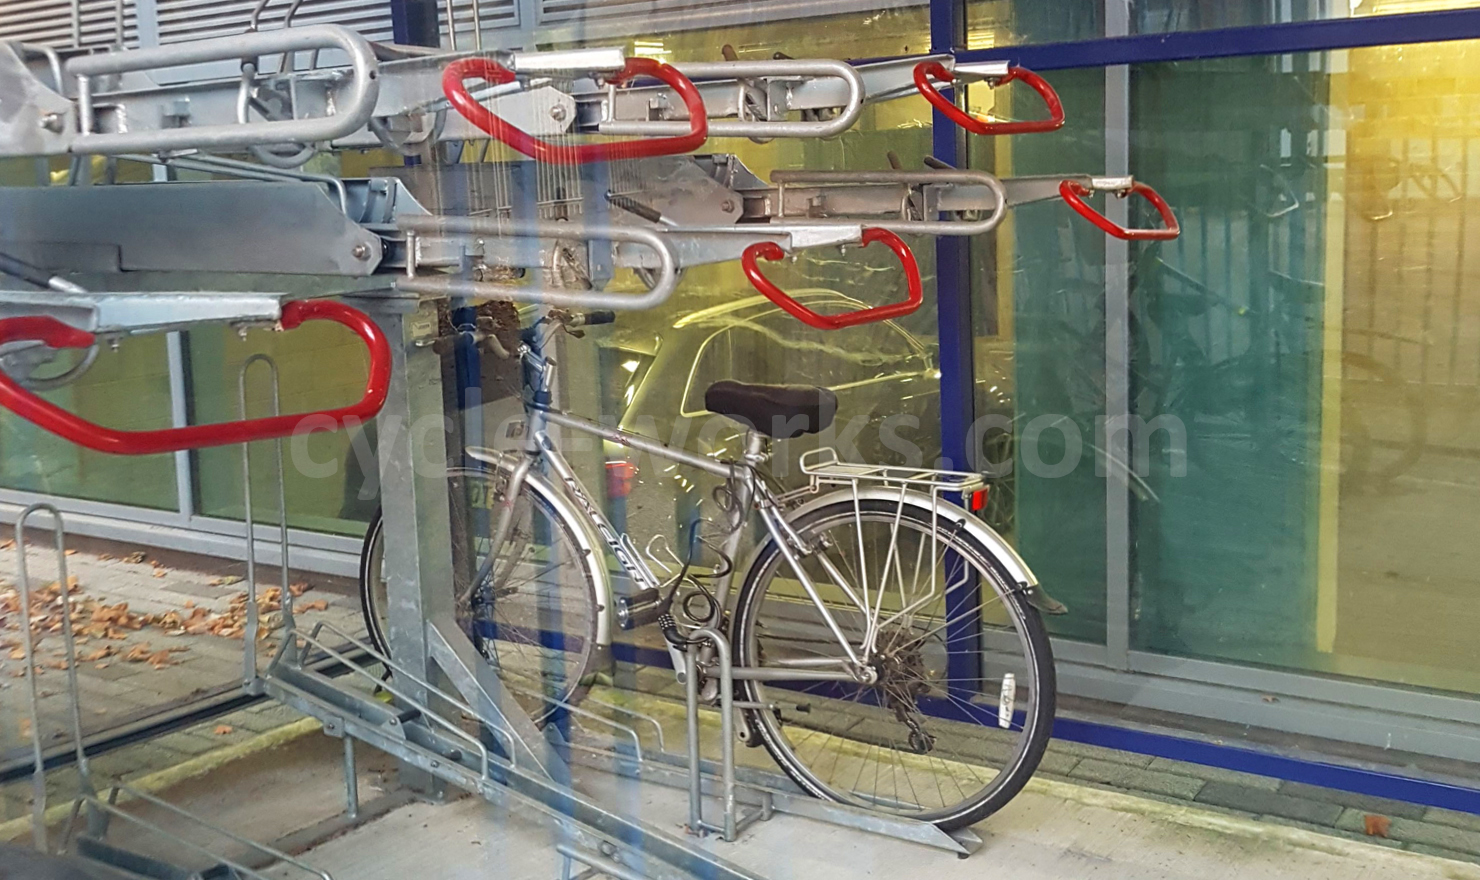 MS Amlin Josta 2-Tier Cycle Rack